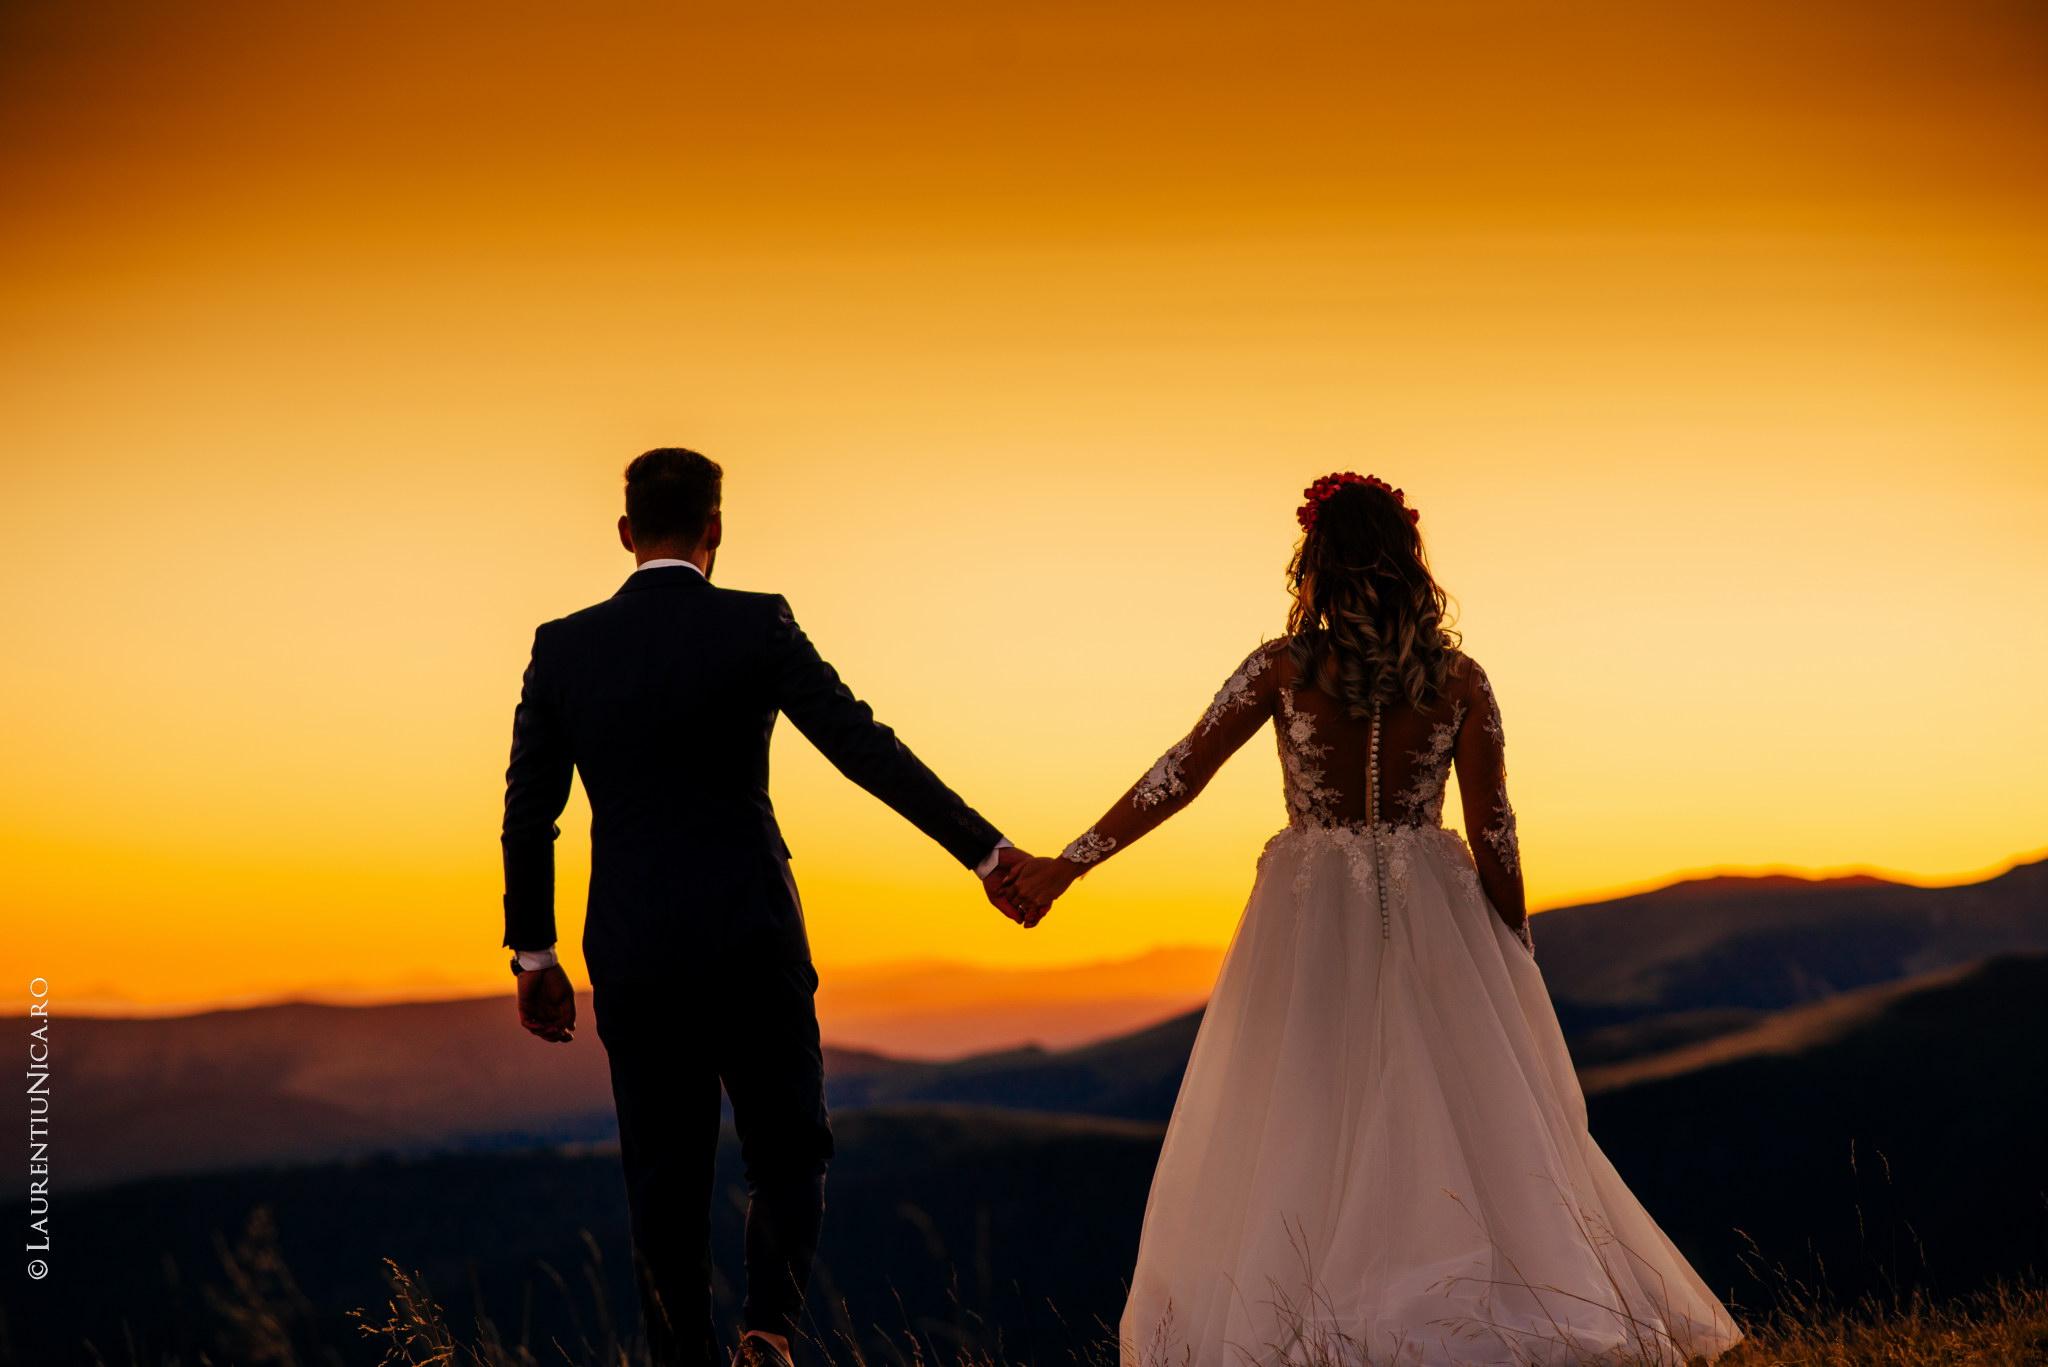 aida si alin fotograf nunta laurentiu nica transalpina 29 - Aida & Alin | Fotografii After Wedding | Transalpina - Muntii Parang